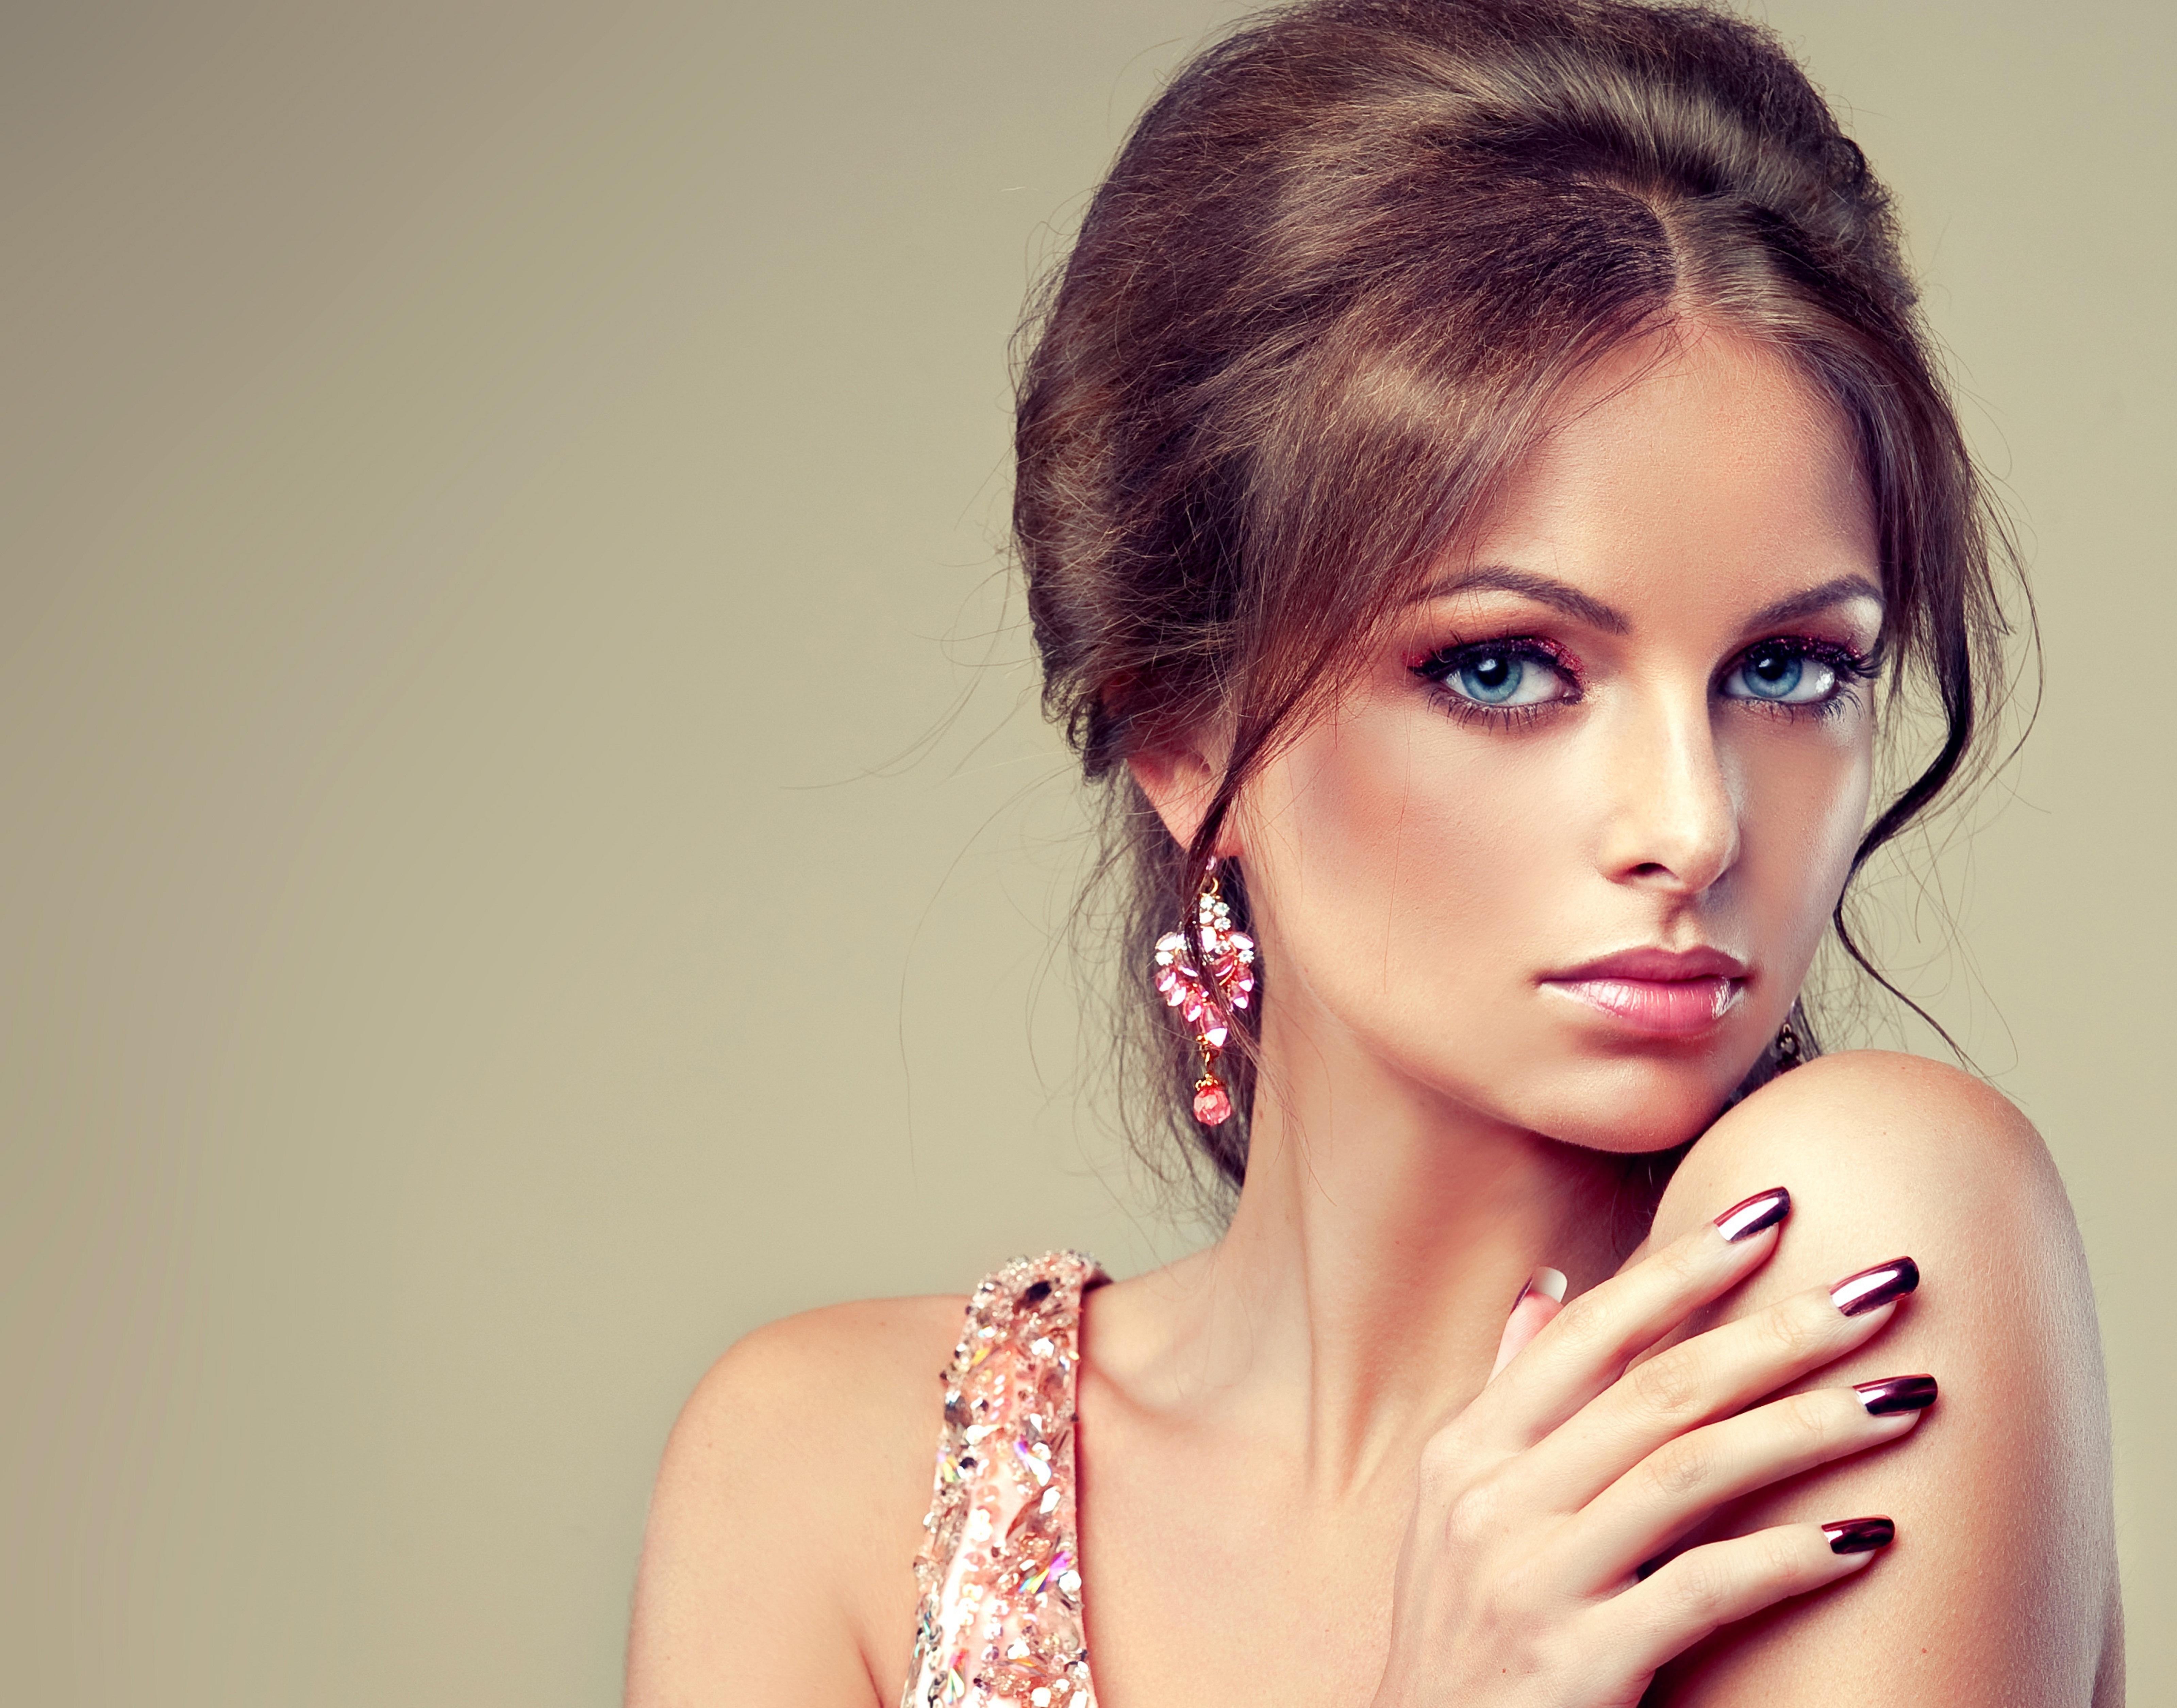 Fashion Beauty Model Girl 5k Retina Ultra HD Wallpaper